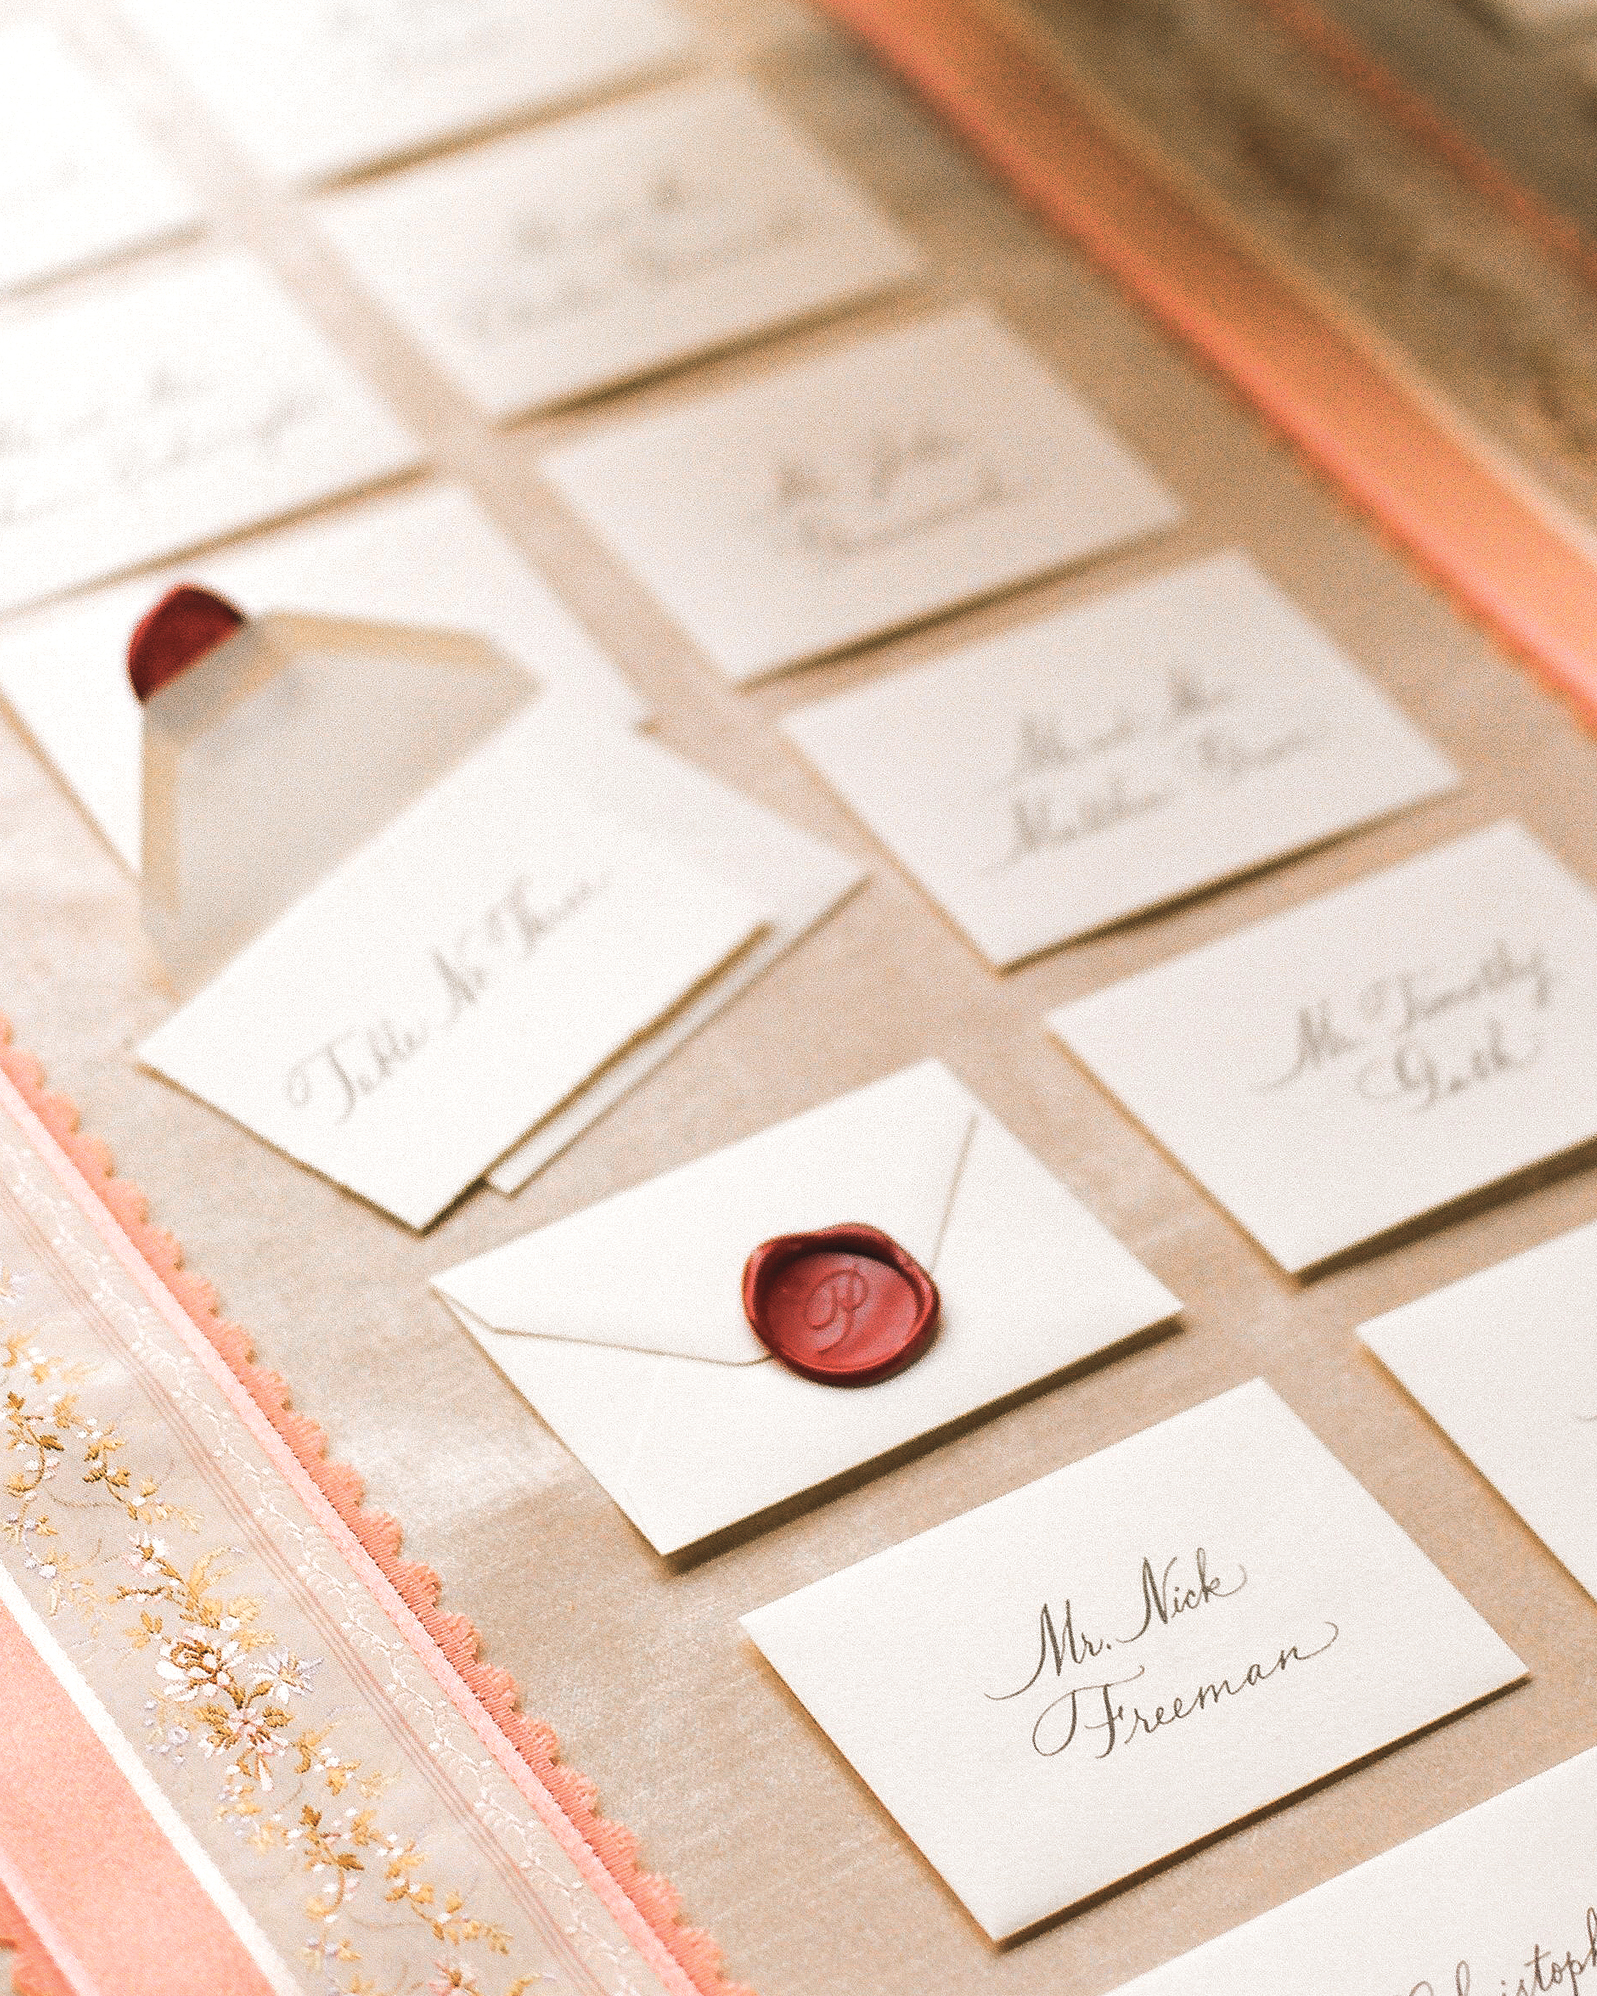 alix-bill-wedding-383-9086-15-2014-32-xl-d111617.jpg